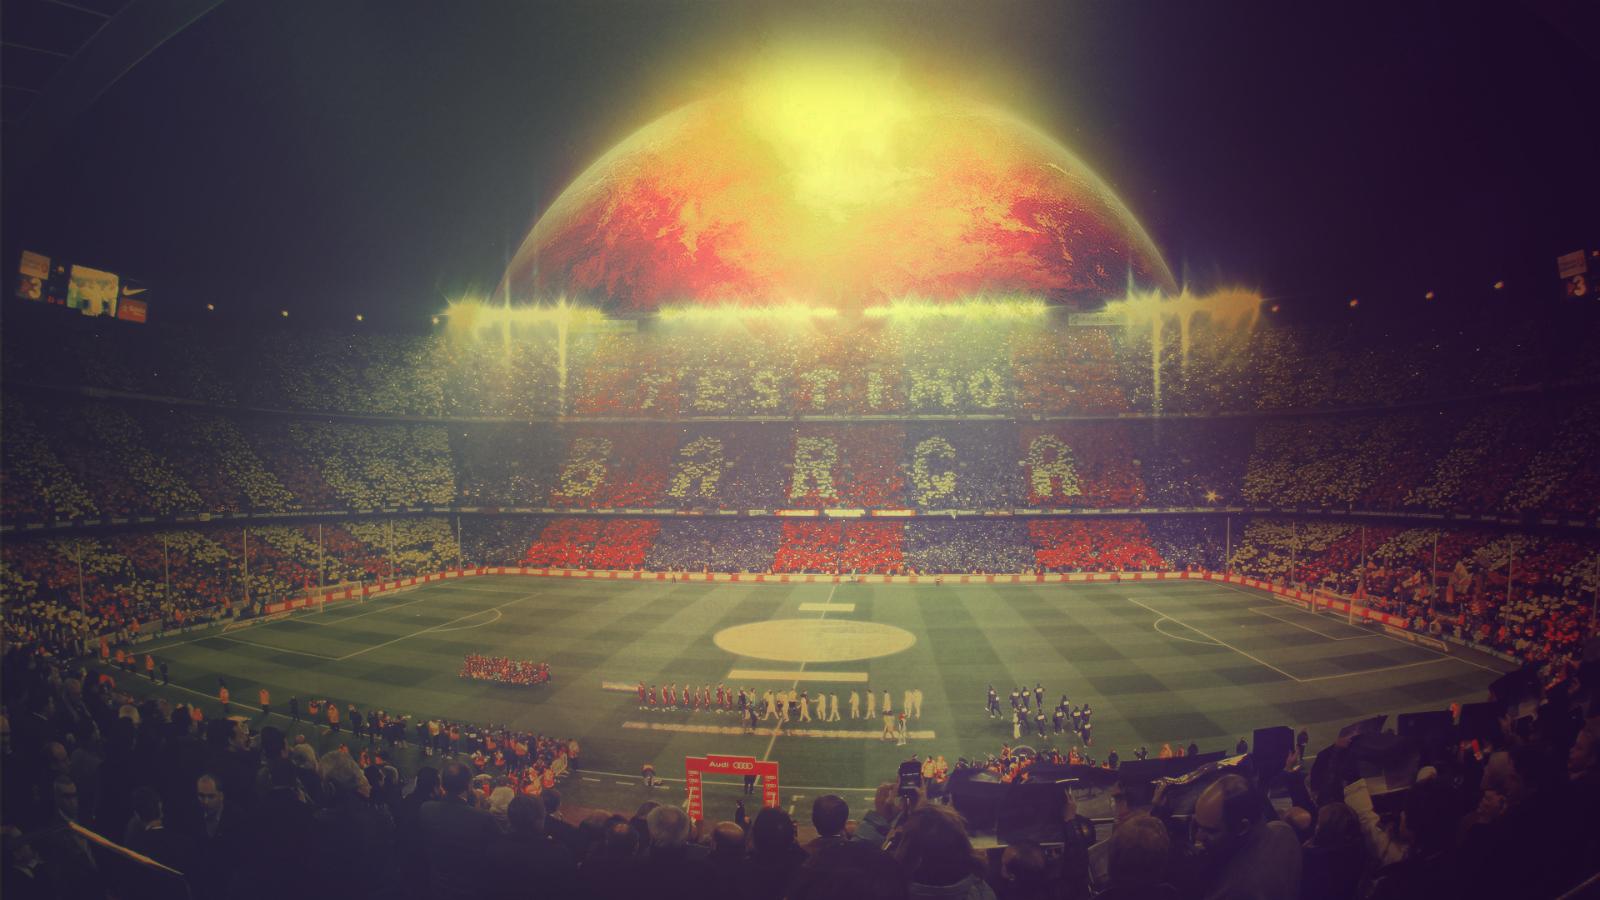 http://1.bp.blogspot.com/-3BdEfhaAHik/Tlb0-nevJsI/AAAAAAAAApA/xv4KpsUyXcE/s1600/vvallpaper.net_football_club_barcelona_nou_camp_stadium_.jpg